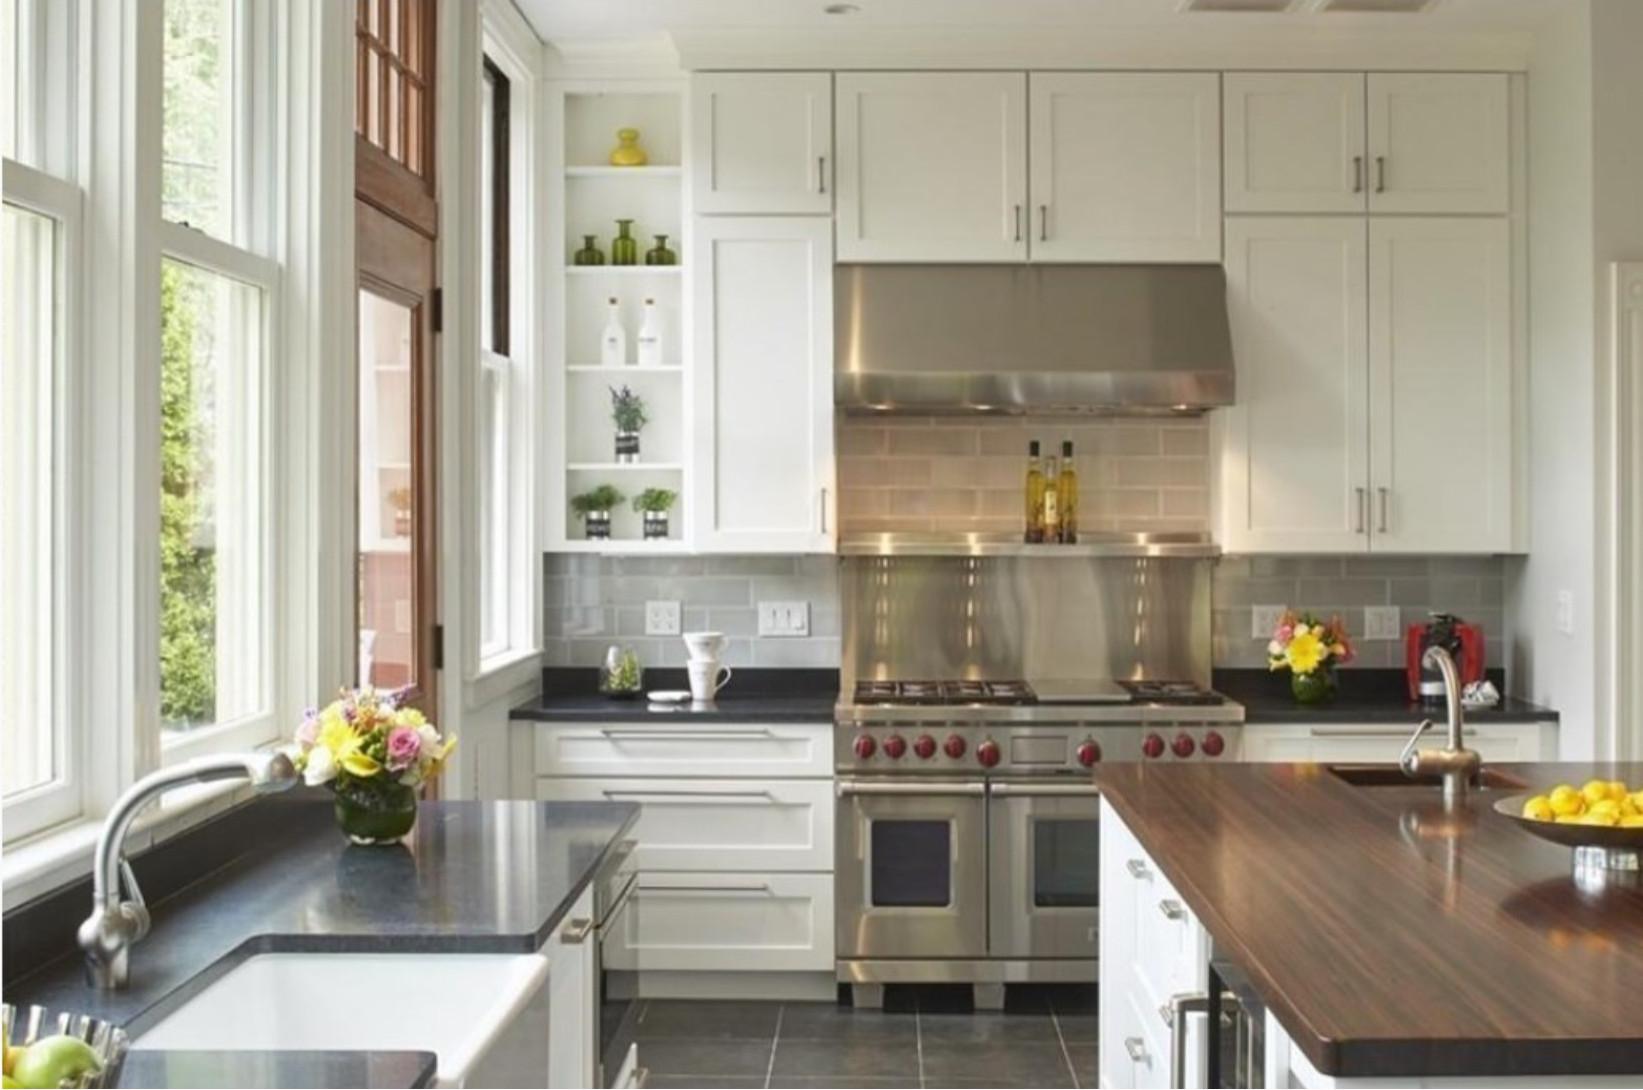 Bright & Airy Winchester Kitchen